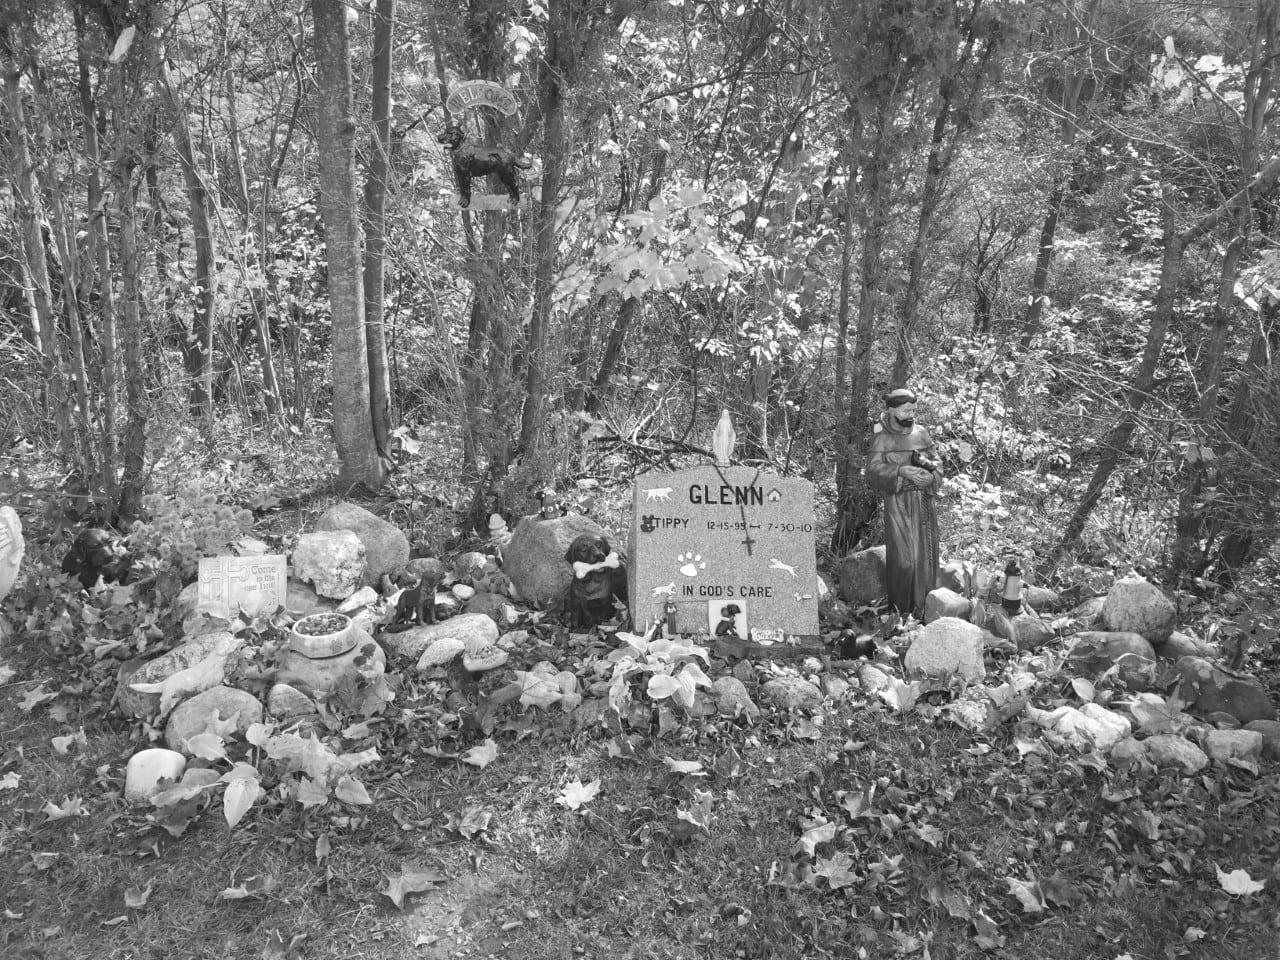 Pet gravesite